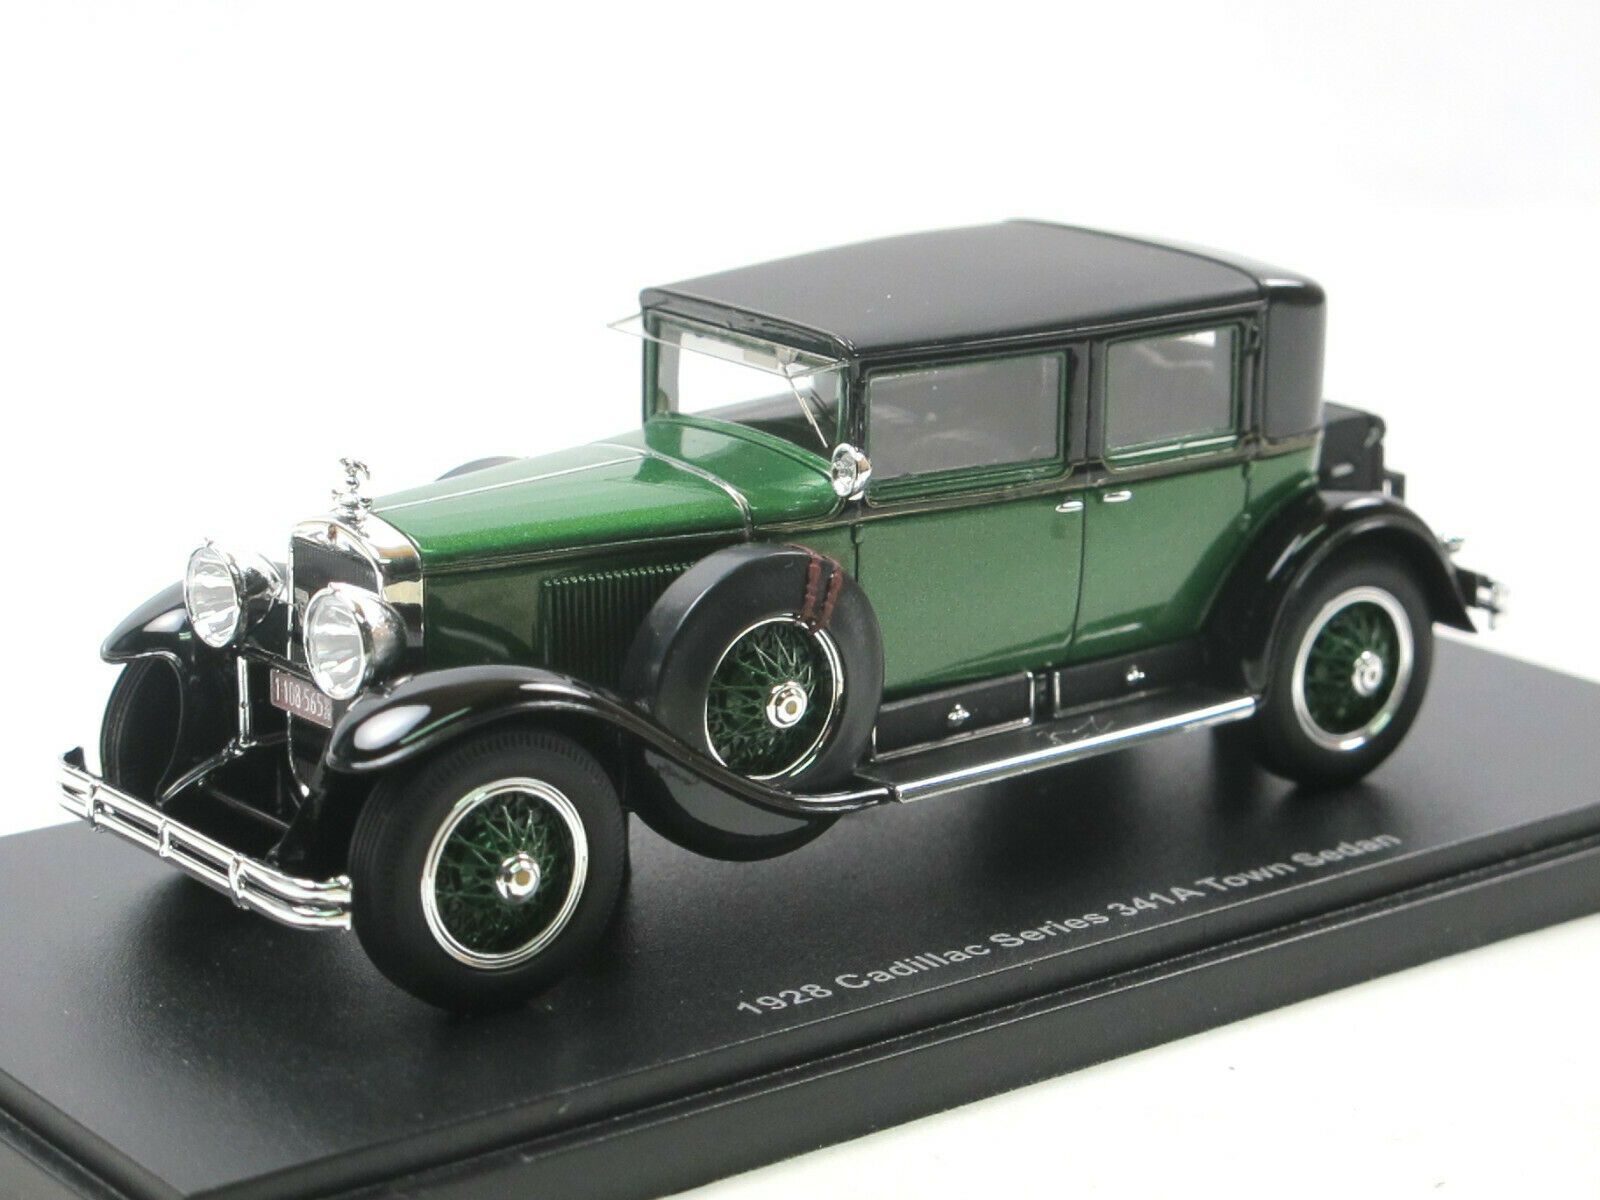 ESVAL MODELS - 1928 illac Series 341 A Town Sedan Al Capone armoruge car 1 43